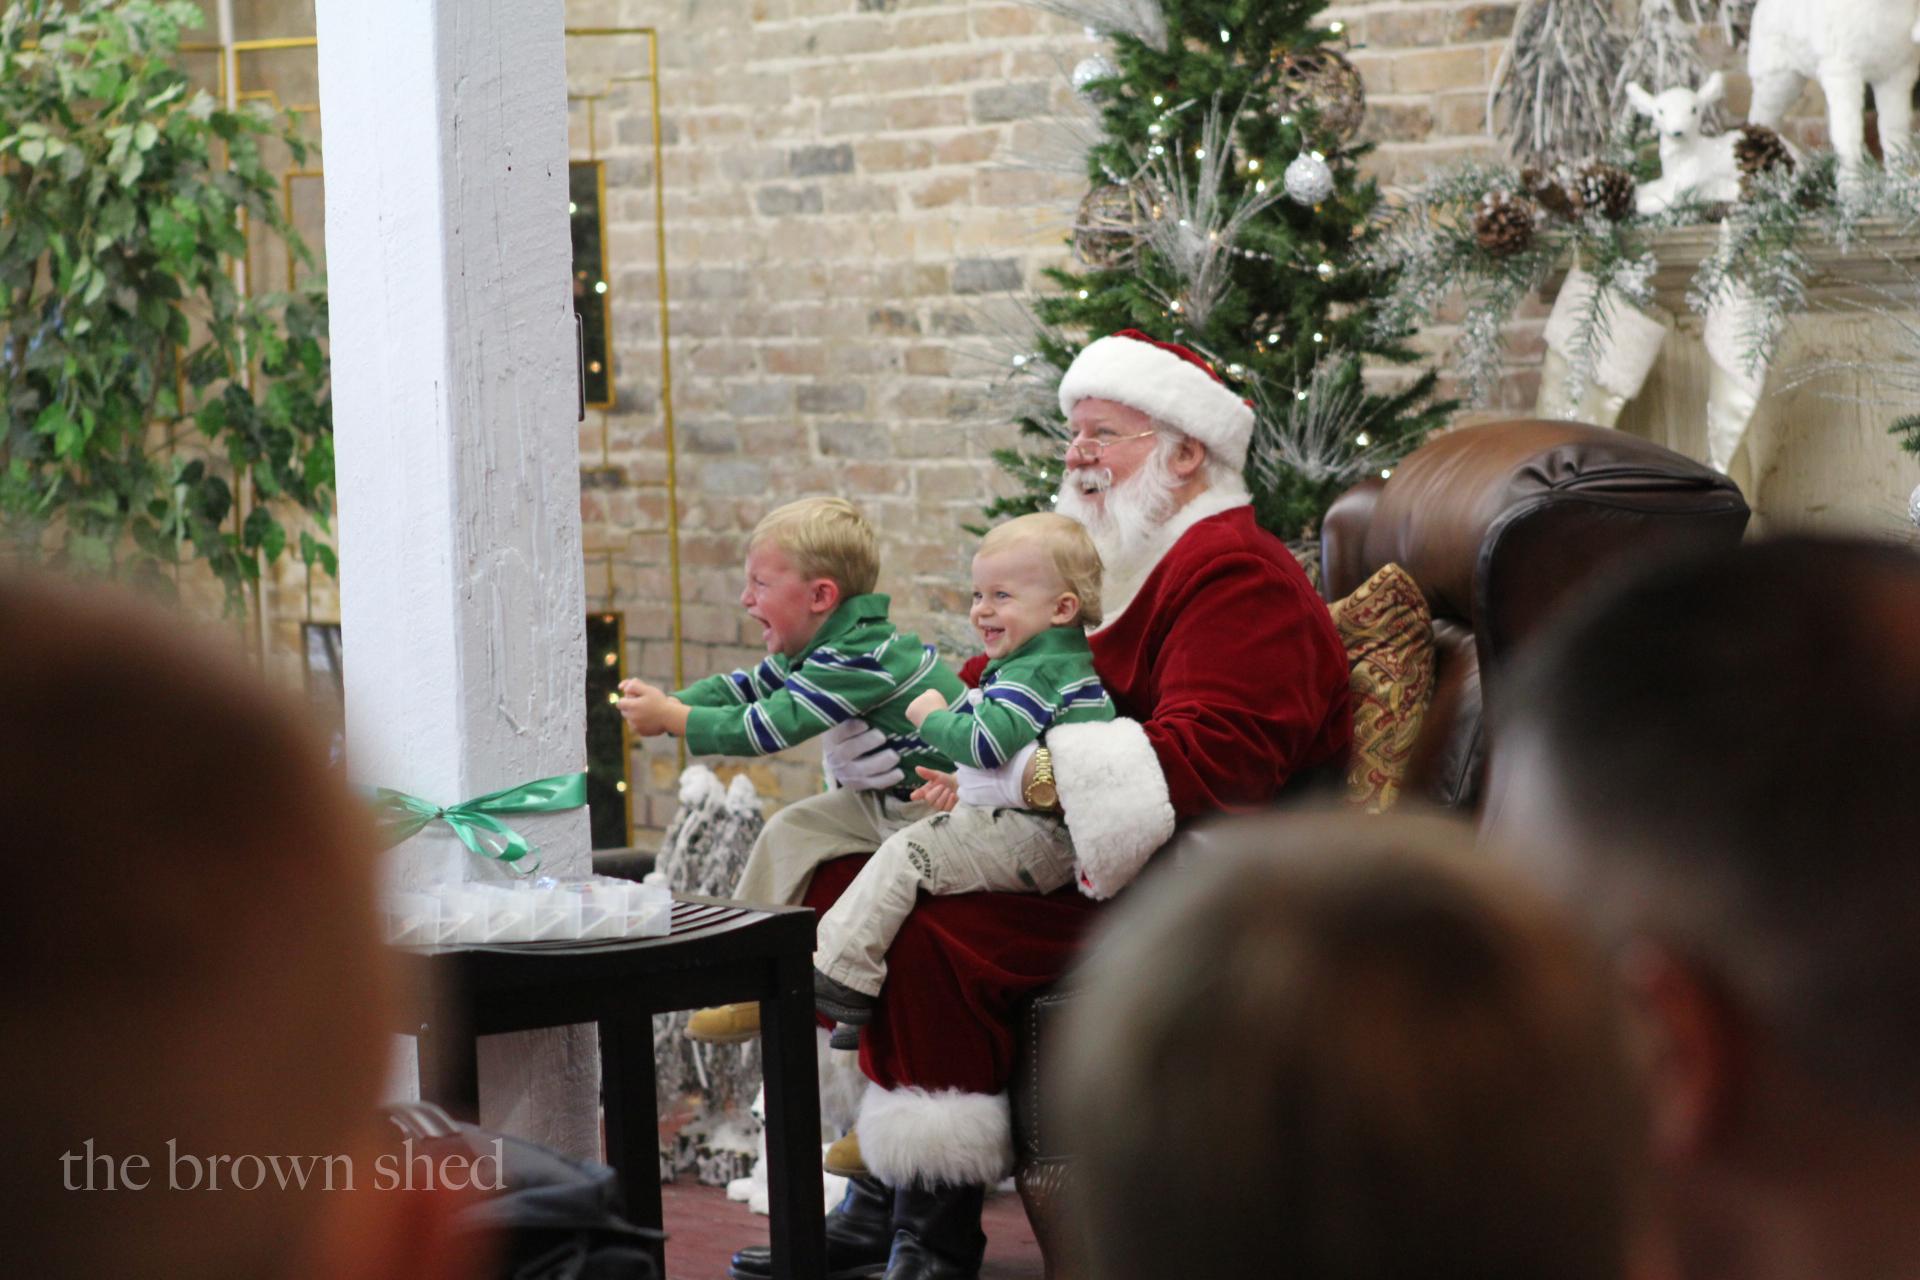 Santa | thebrownshed.com